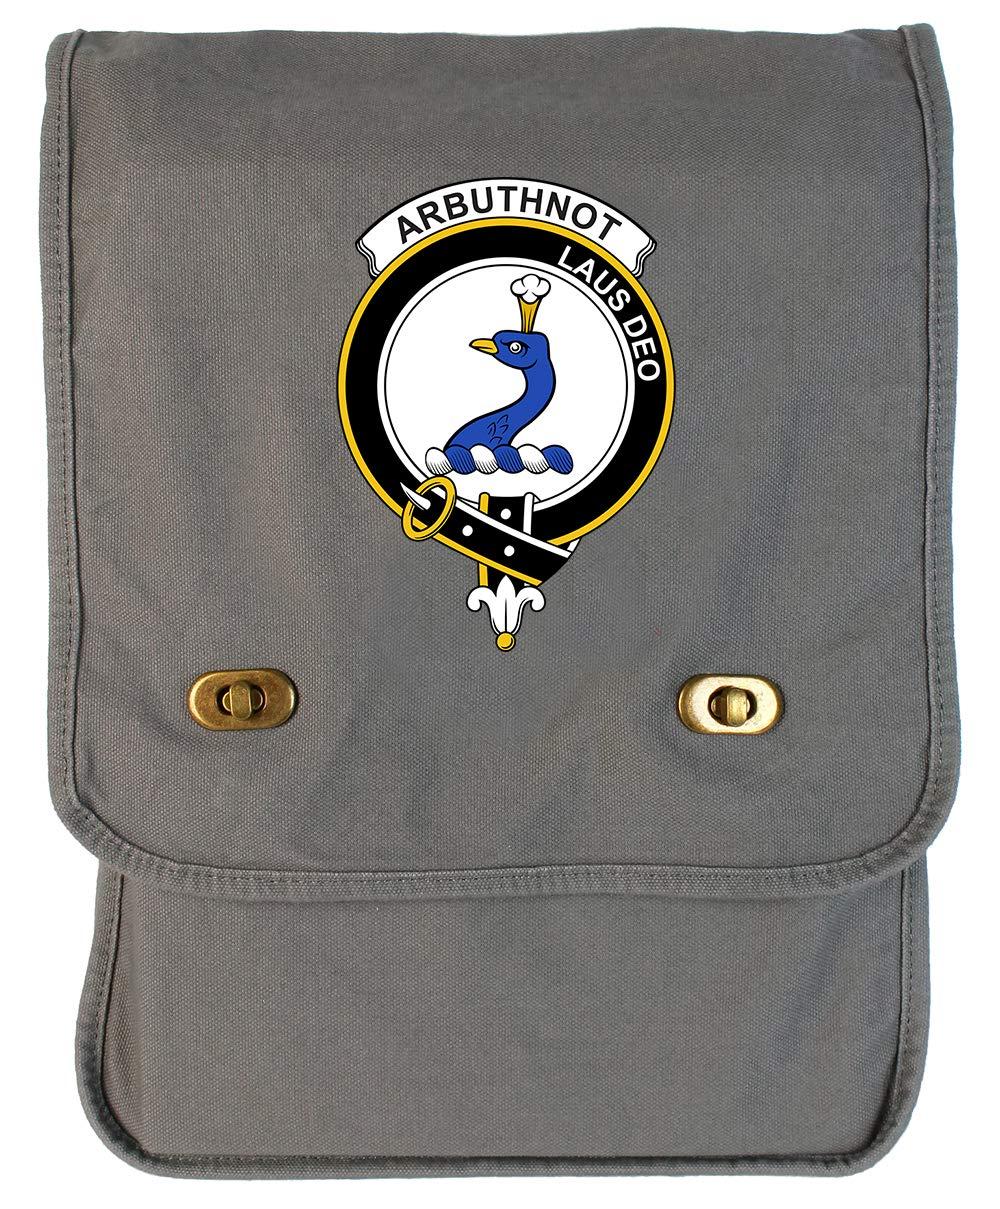 Tenacitee Scottish Clan Crest Badge Arbuthnot Khaki Green Raw Edge Canvas Messenger Bag